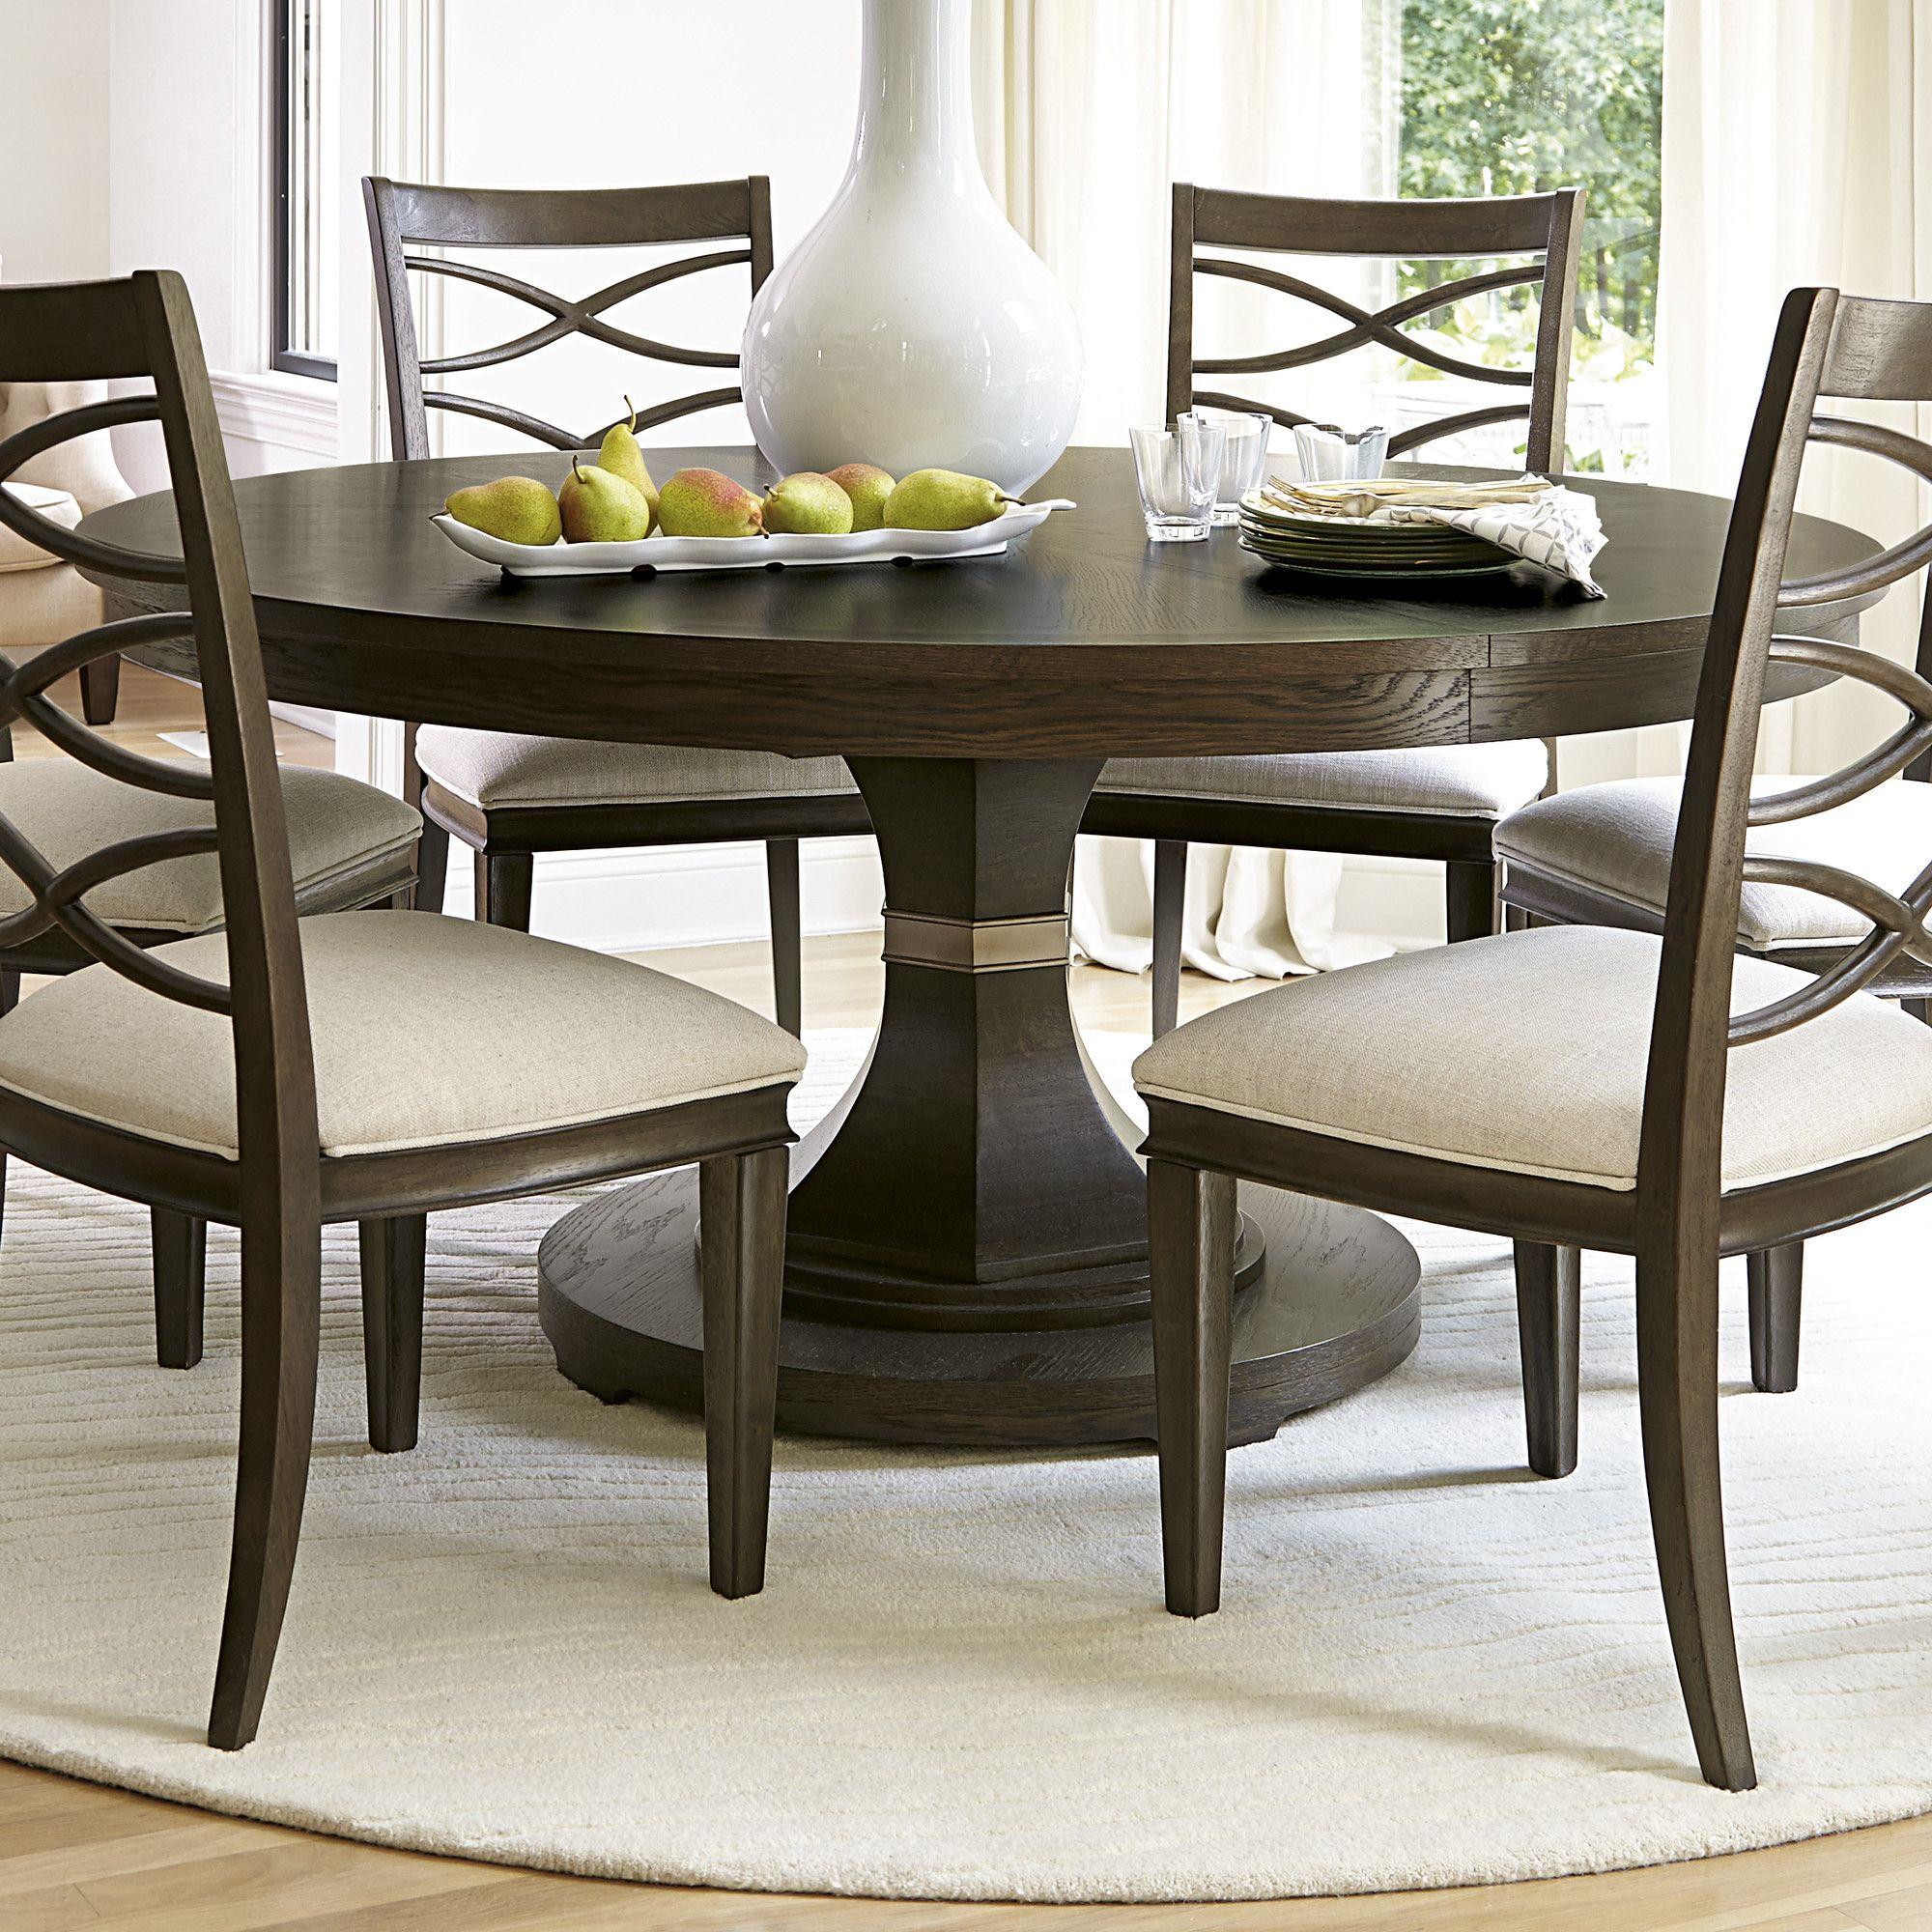 California Extendable Dining Table Wayfair Home Eat Table - Wayfair white round table